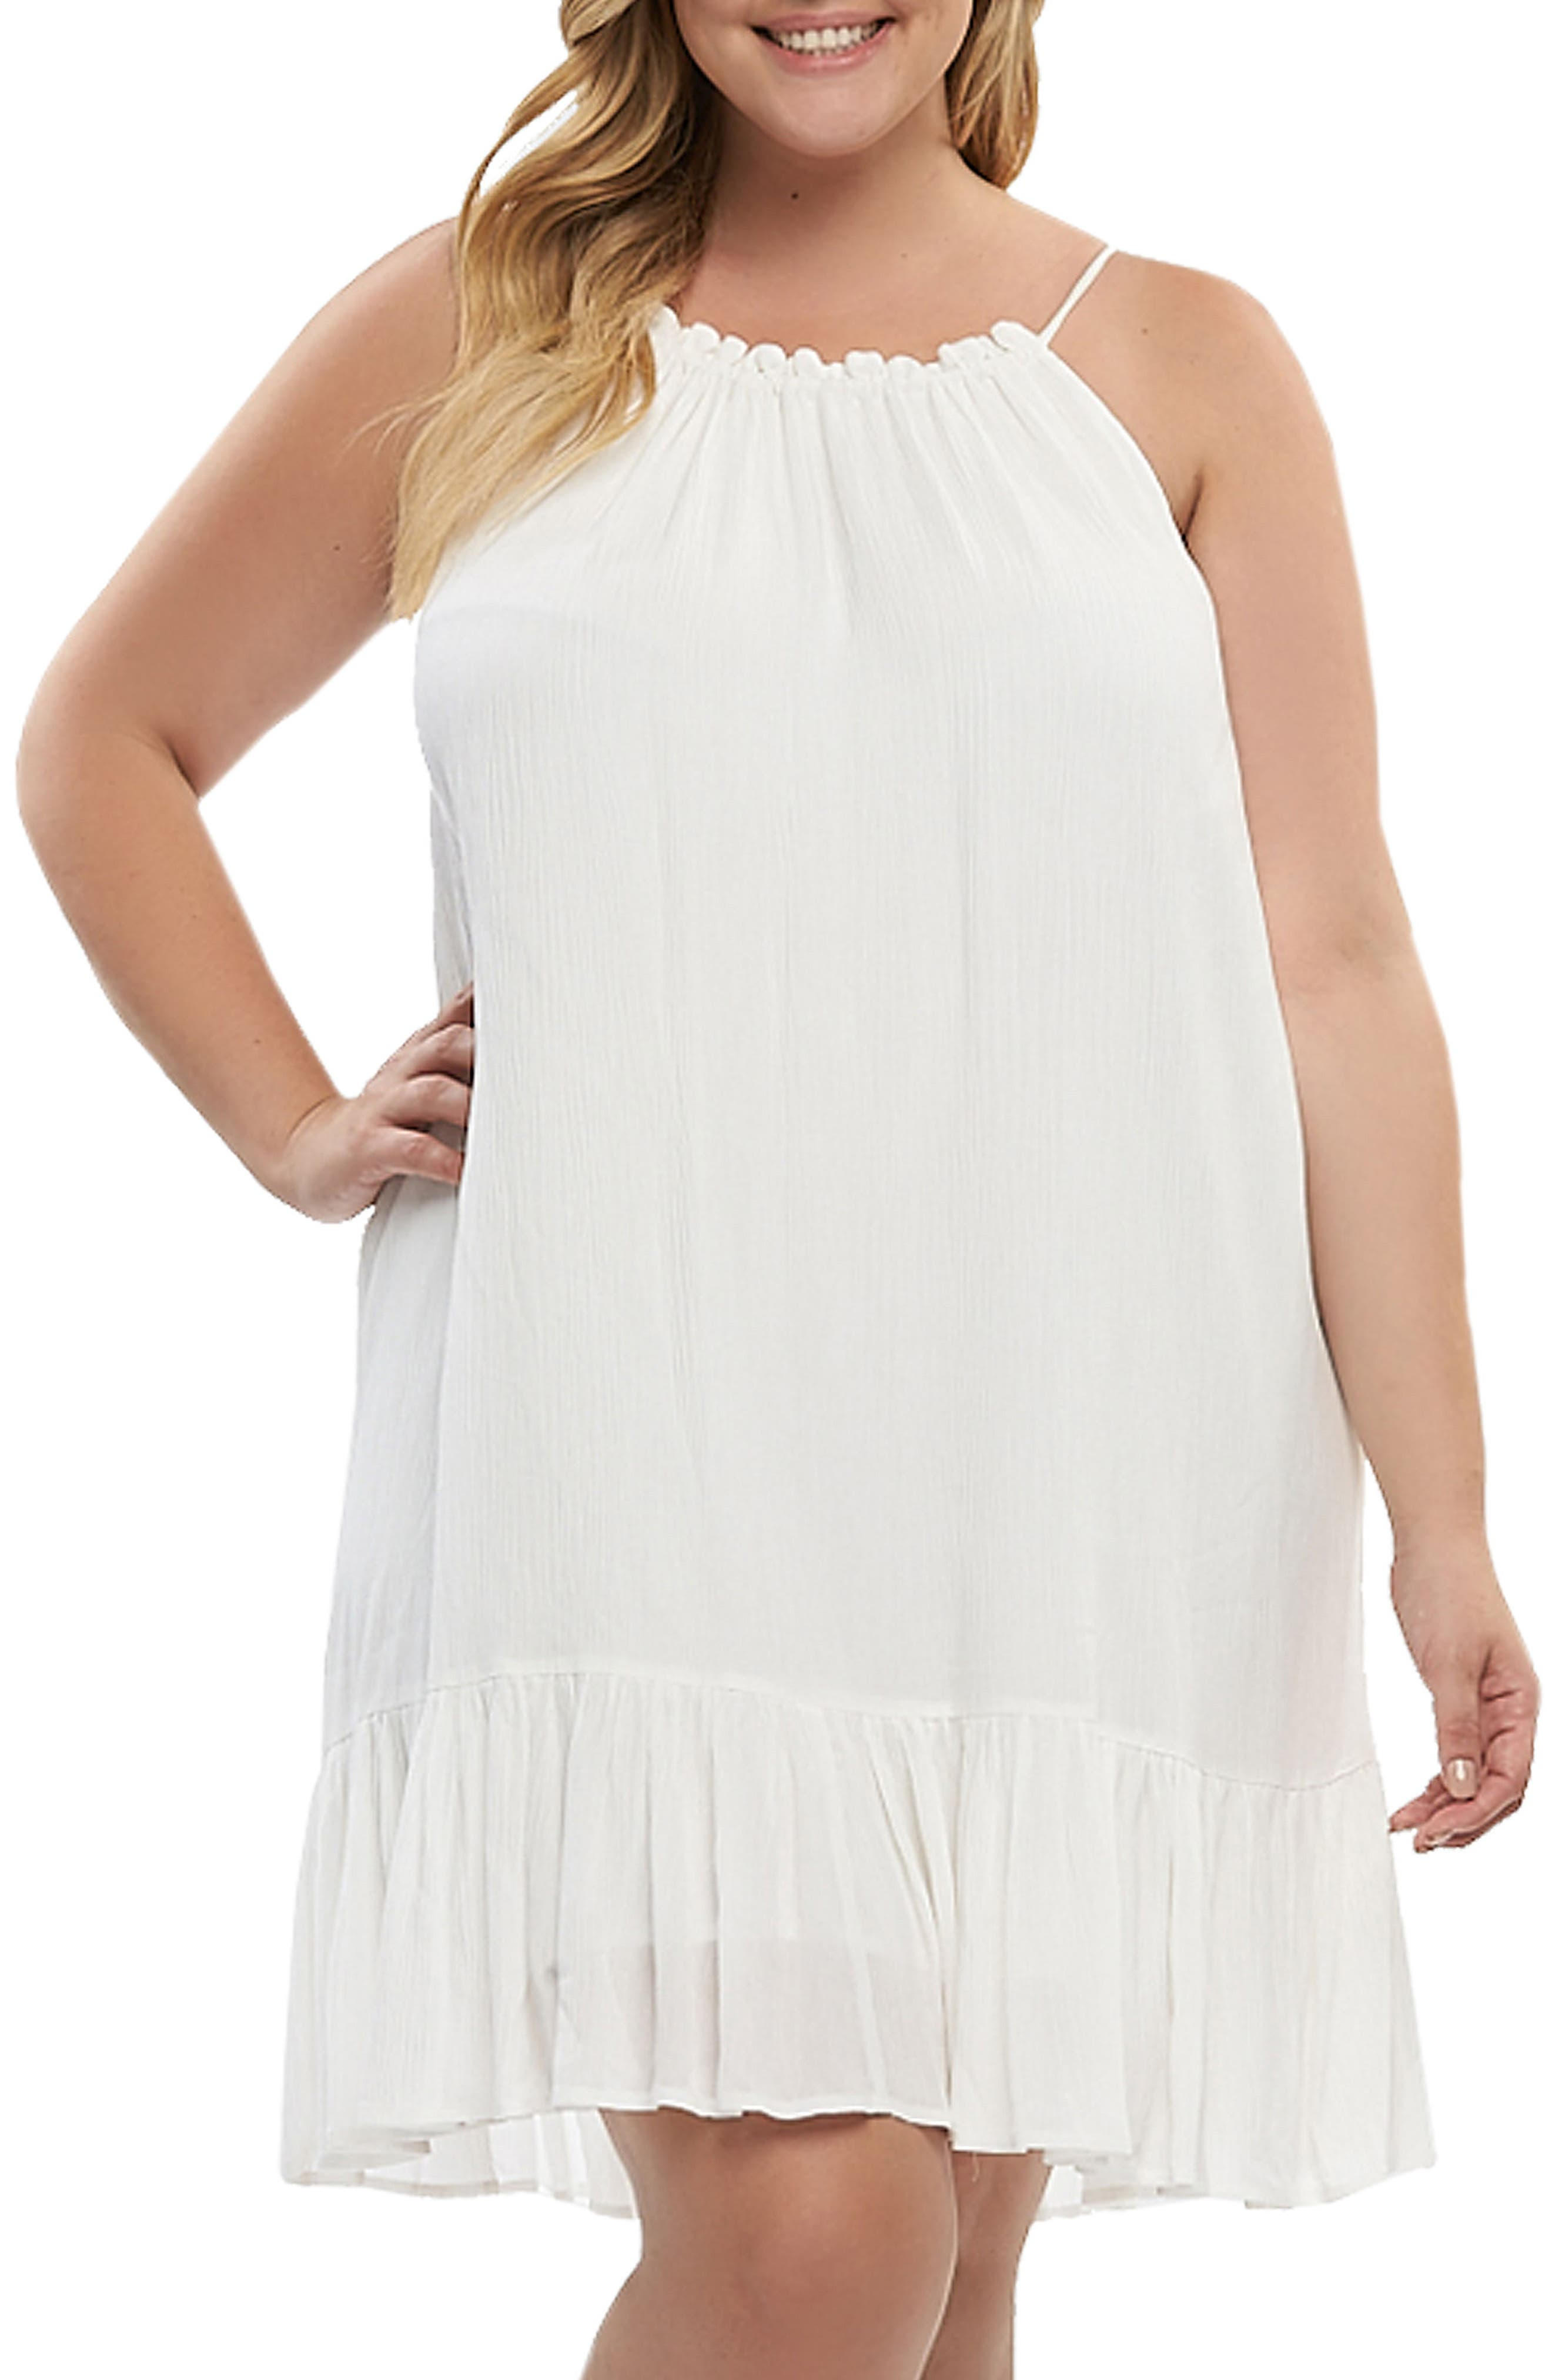 Plus Size Tart Liz Halter Top Baby Doll Dress, White